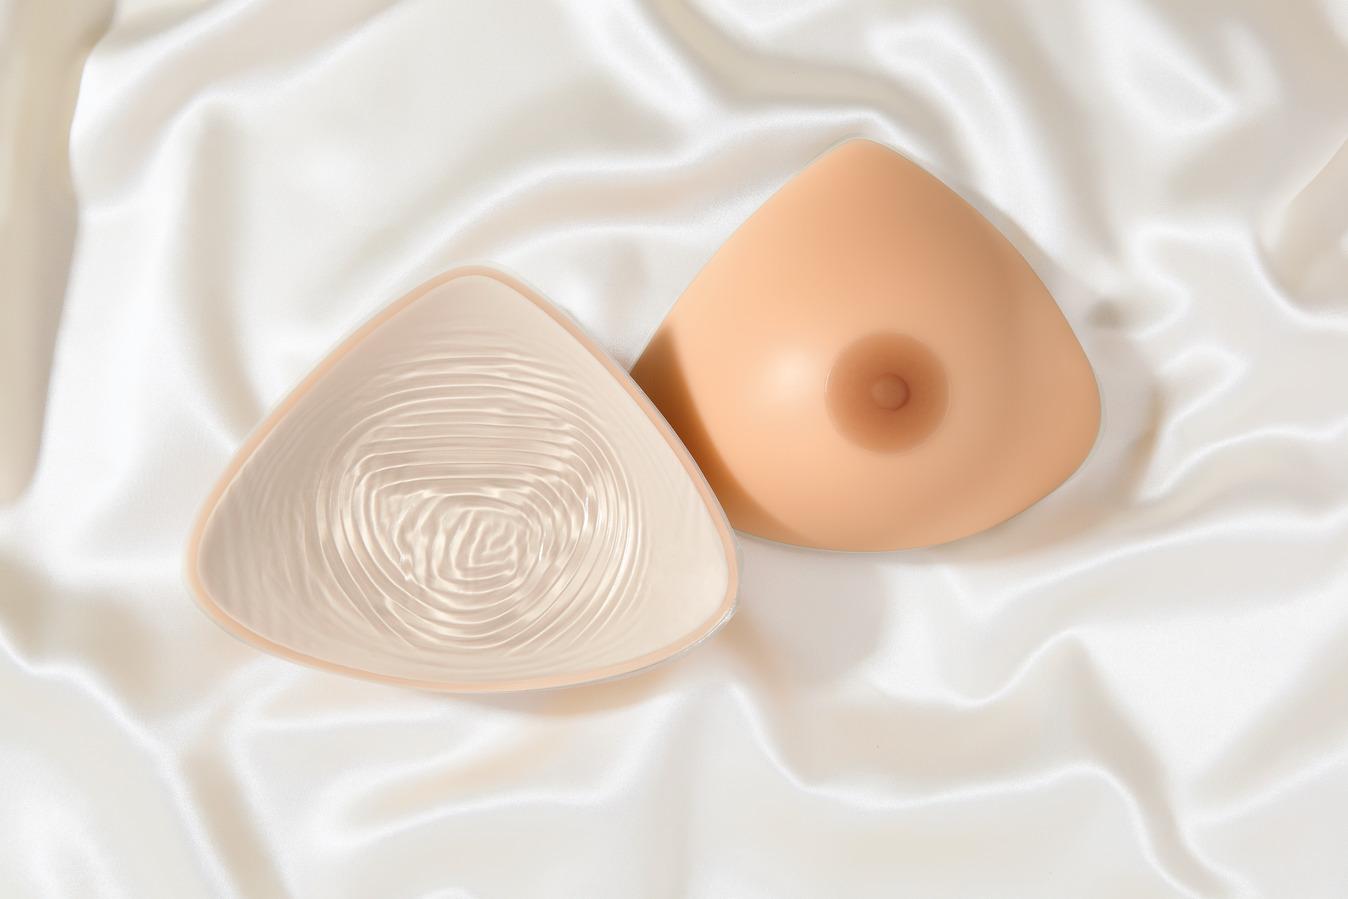 Prothèse mammaire AMOENA Natura Cosmetic 2S Comfort+